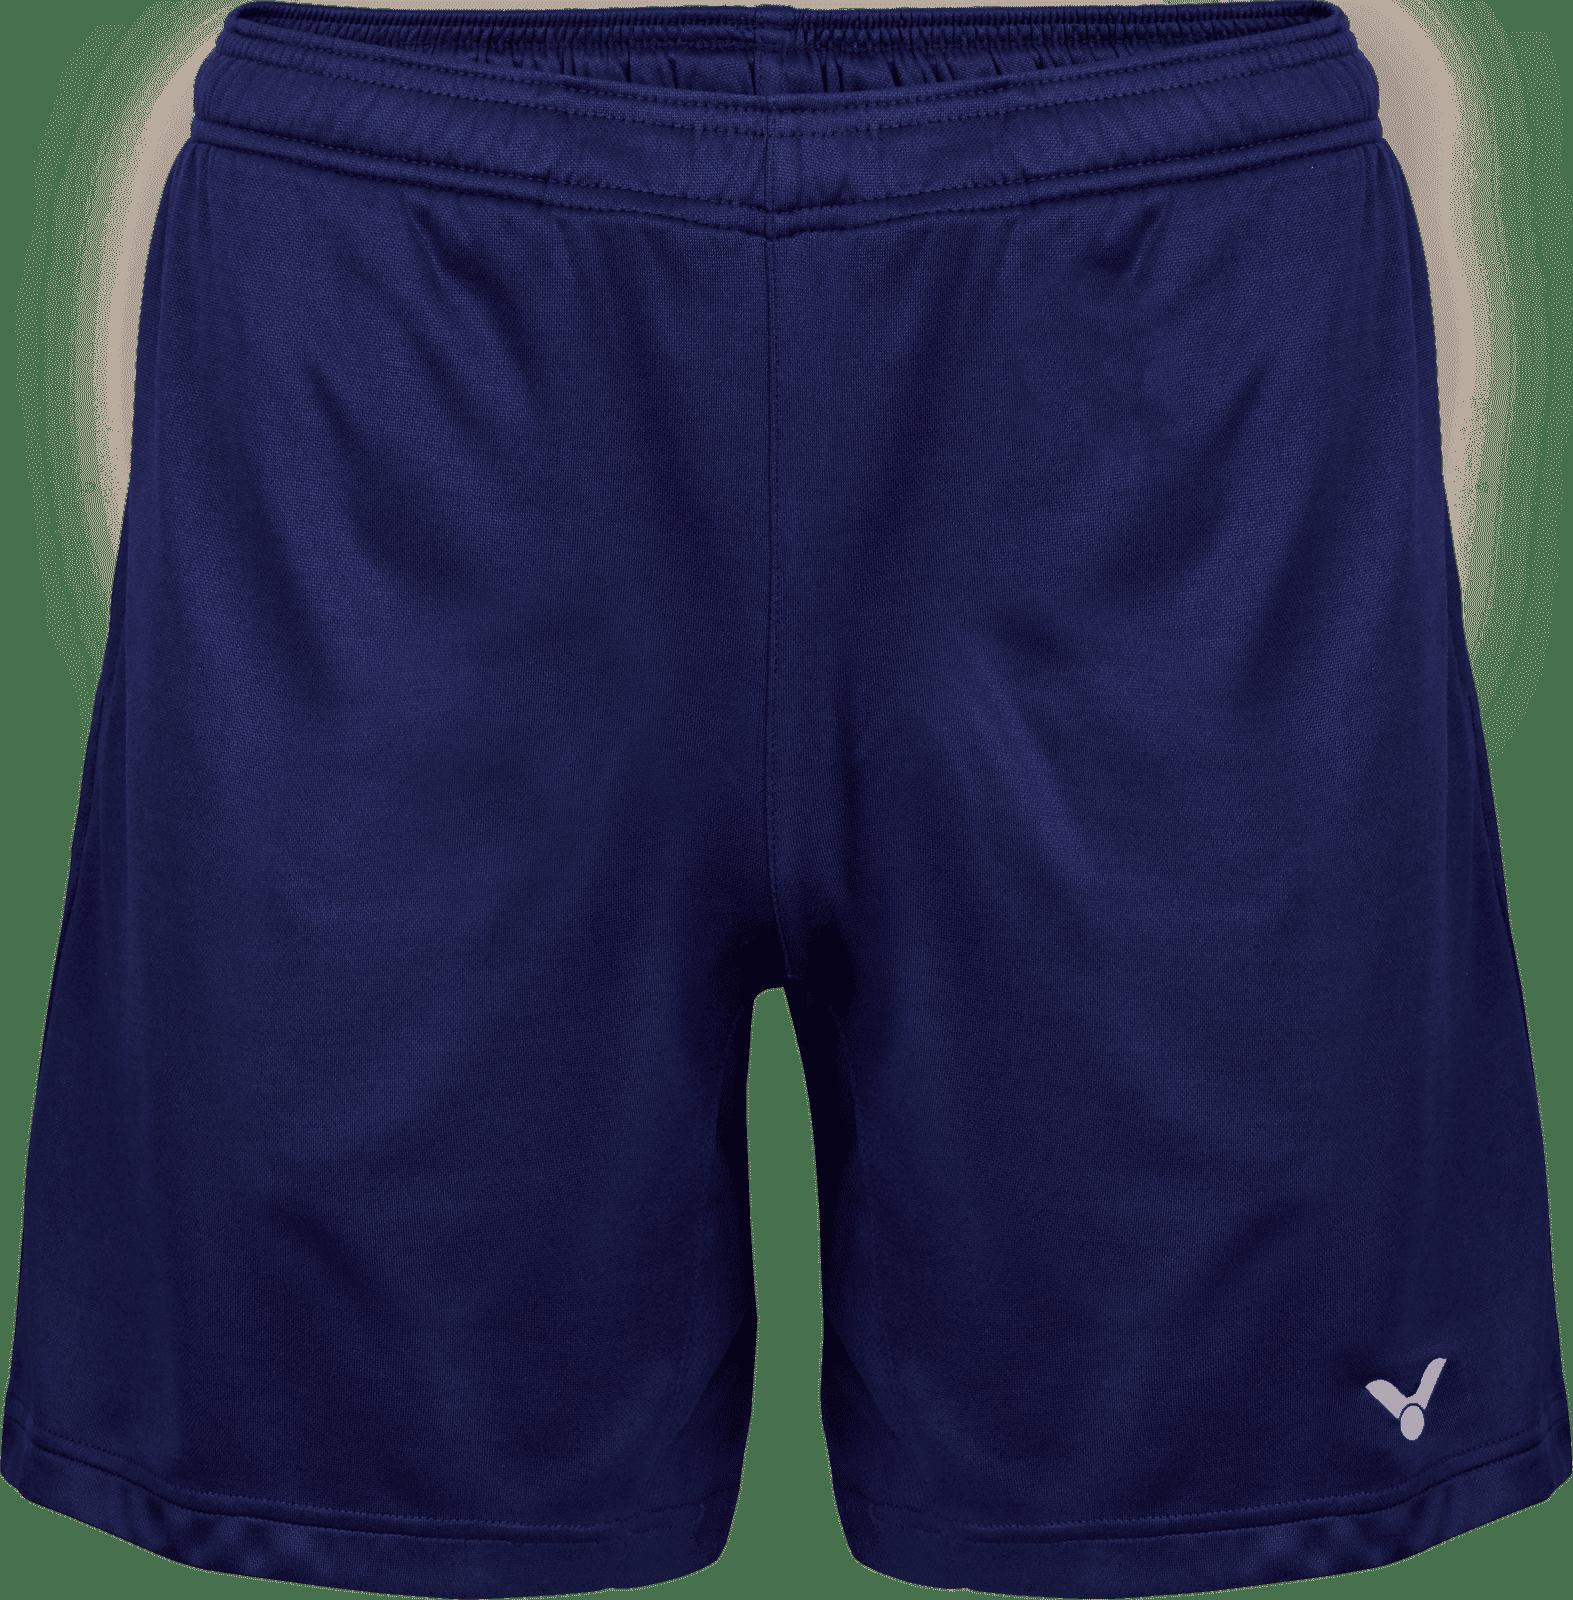 VICTOR Shorts R-03200 B